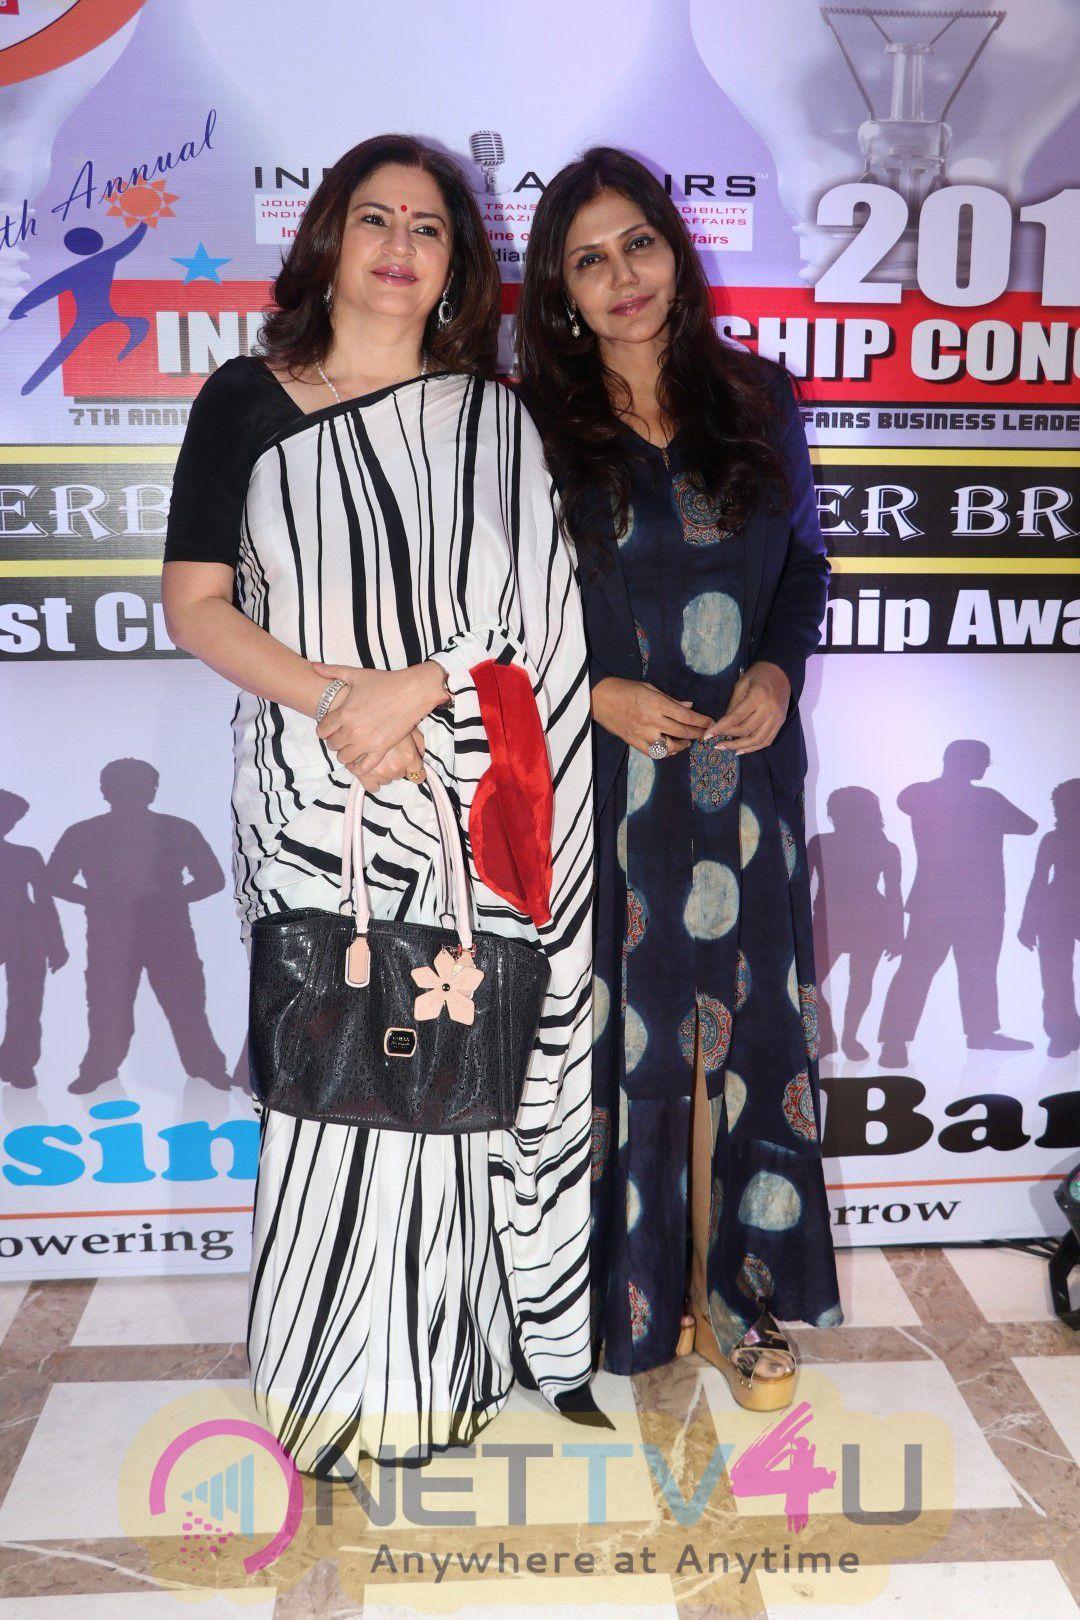 India Leadership Conclave 2016 Award Ceremony Amazing Photos